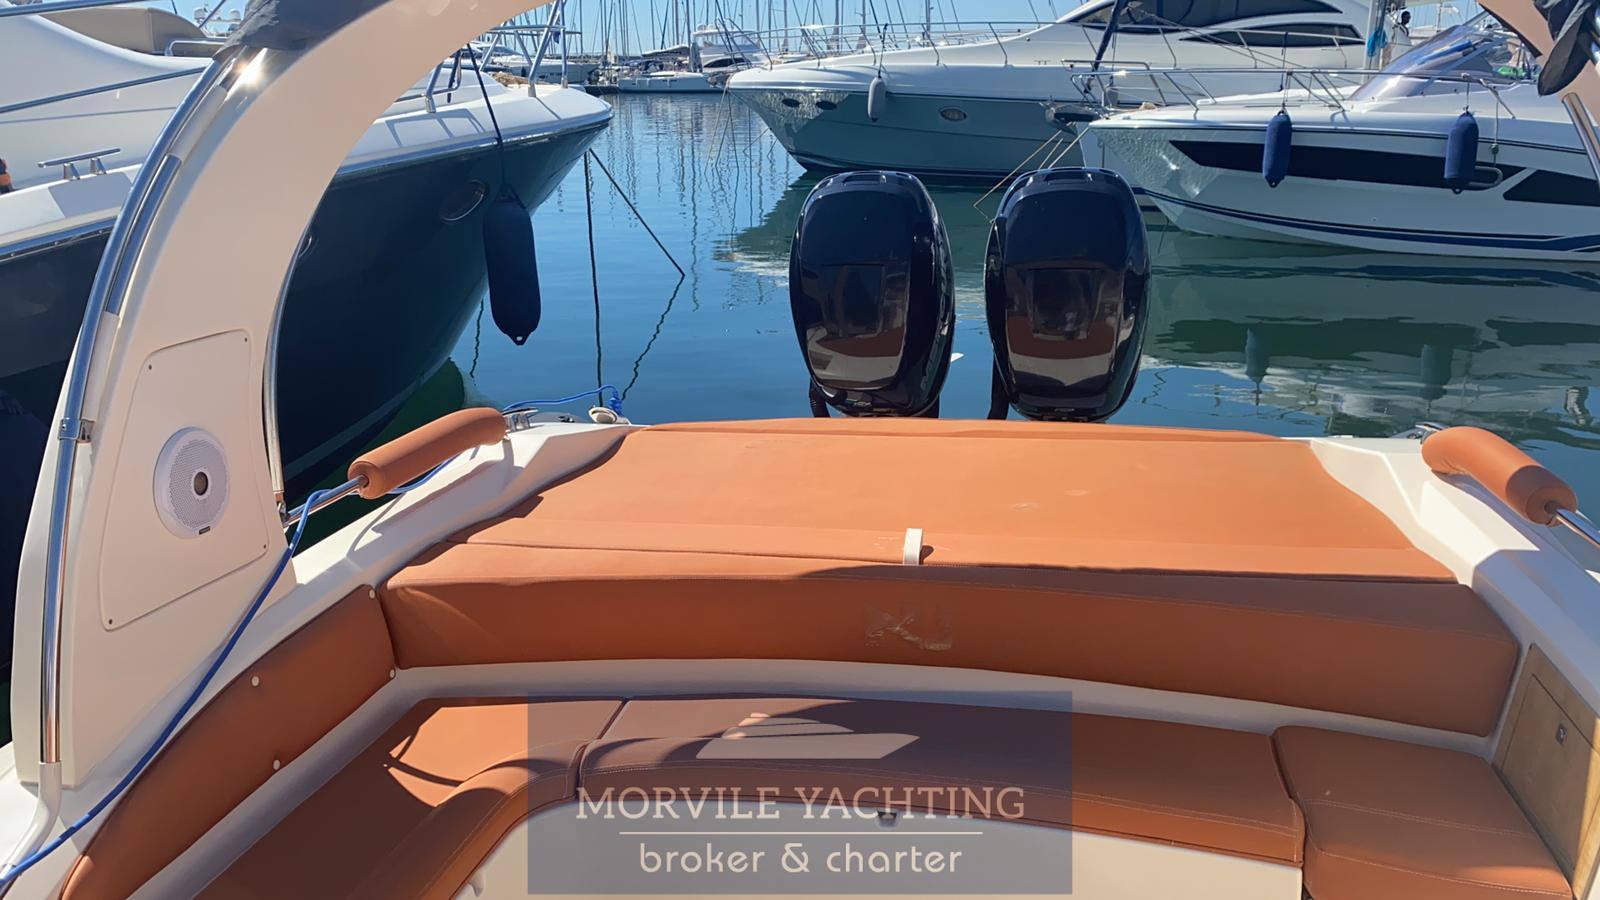 NUOVA JOLLY 35 sport cabin Gommone Подержанные лодки для продажи